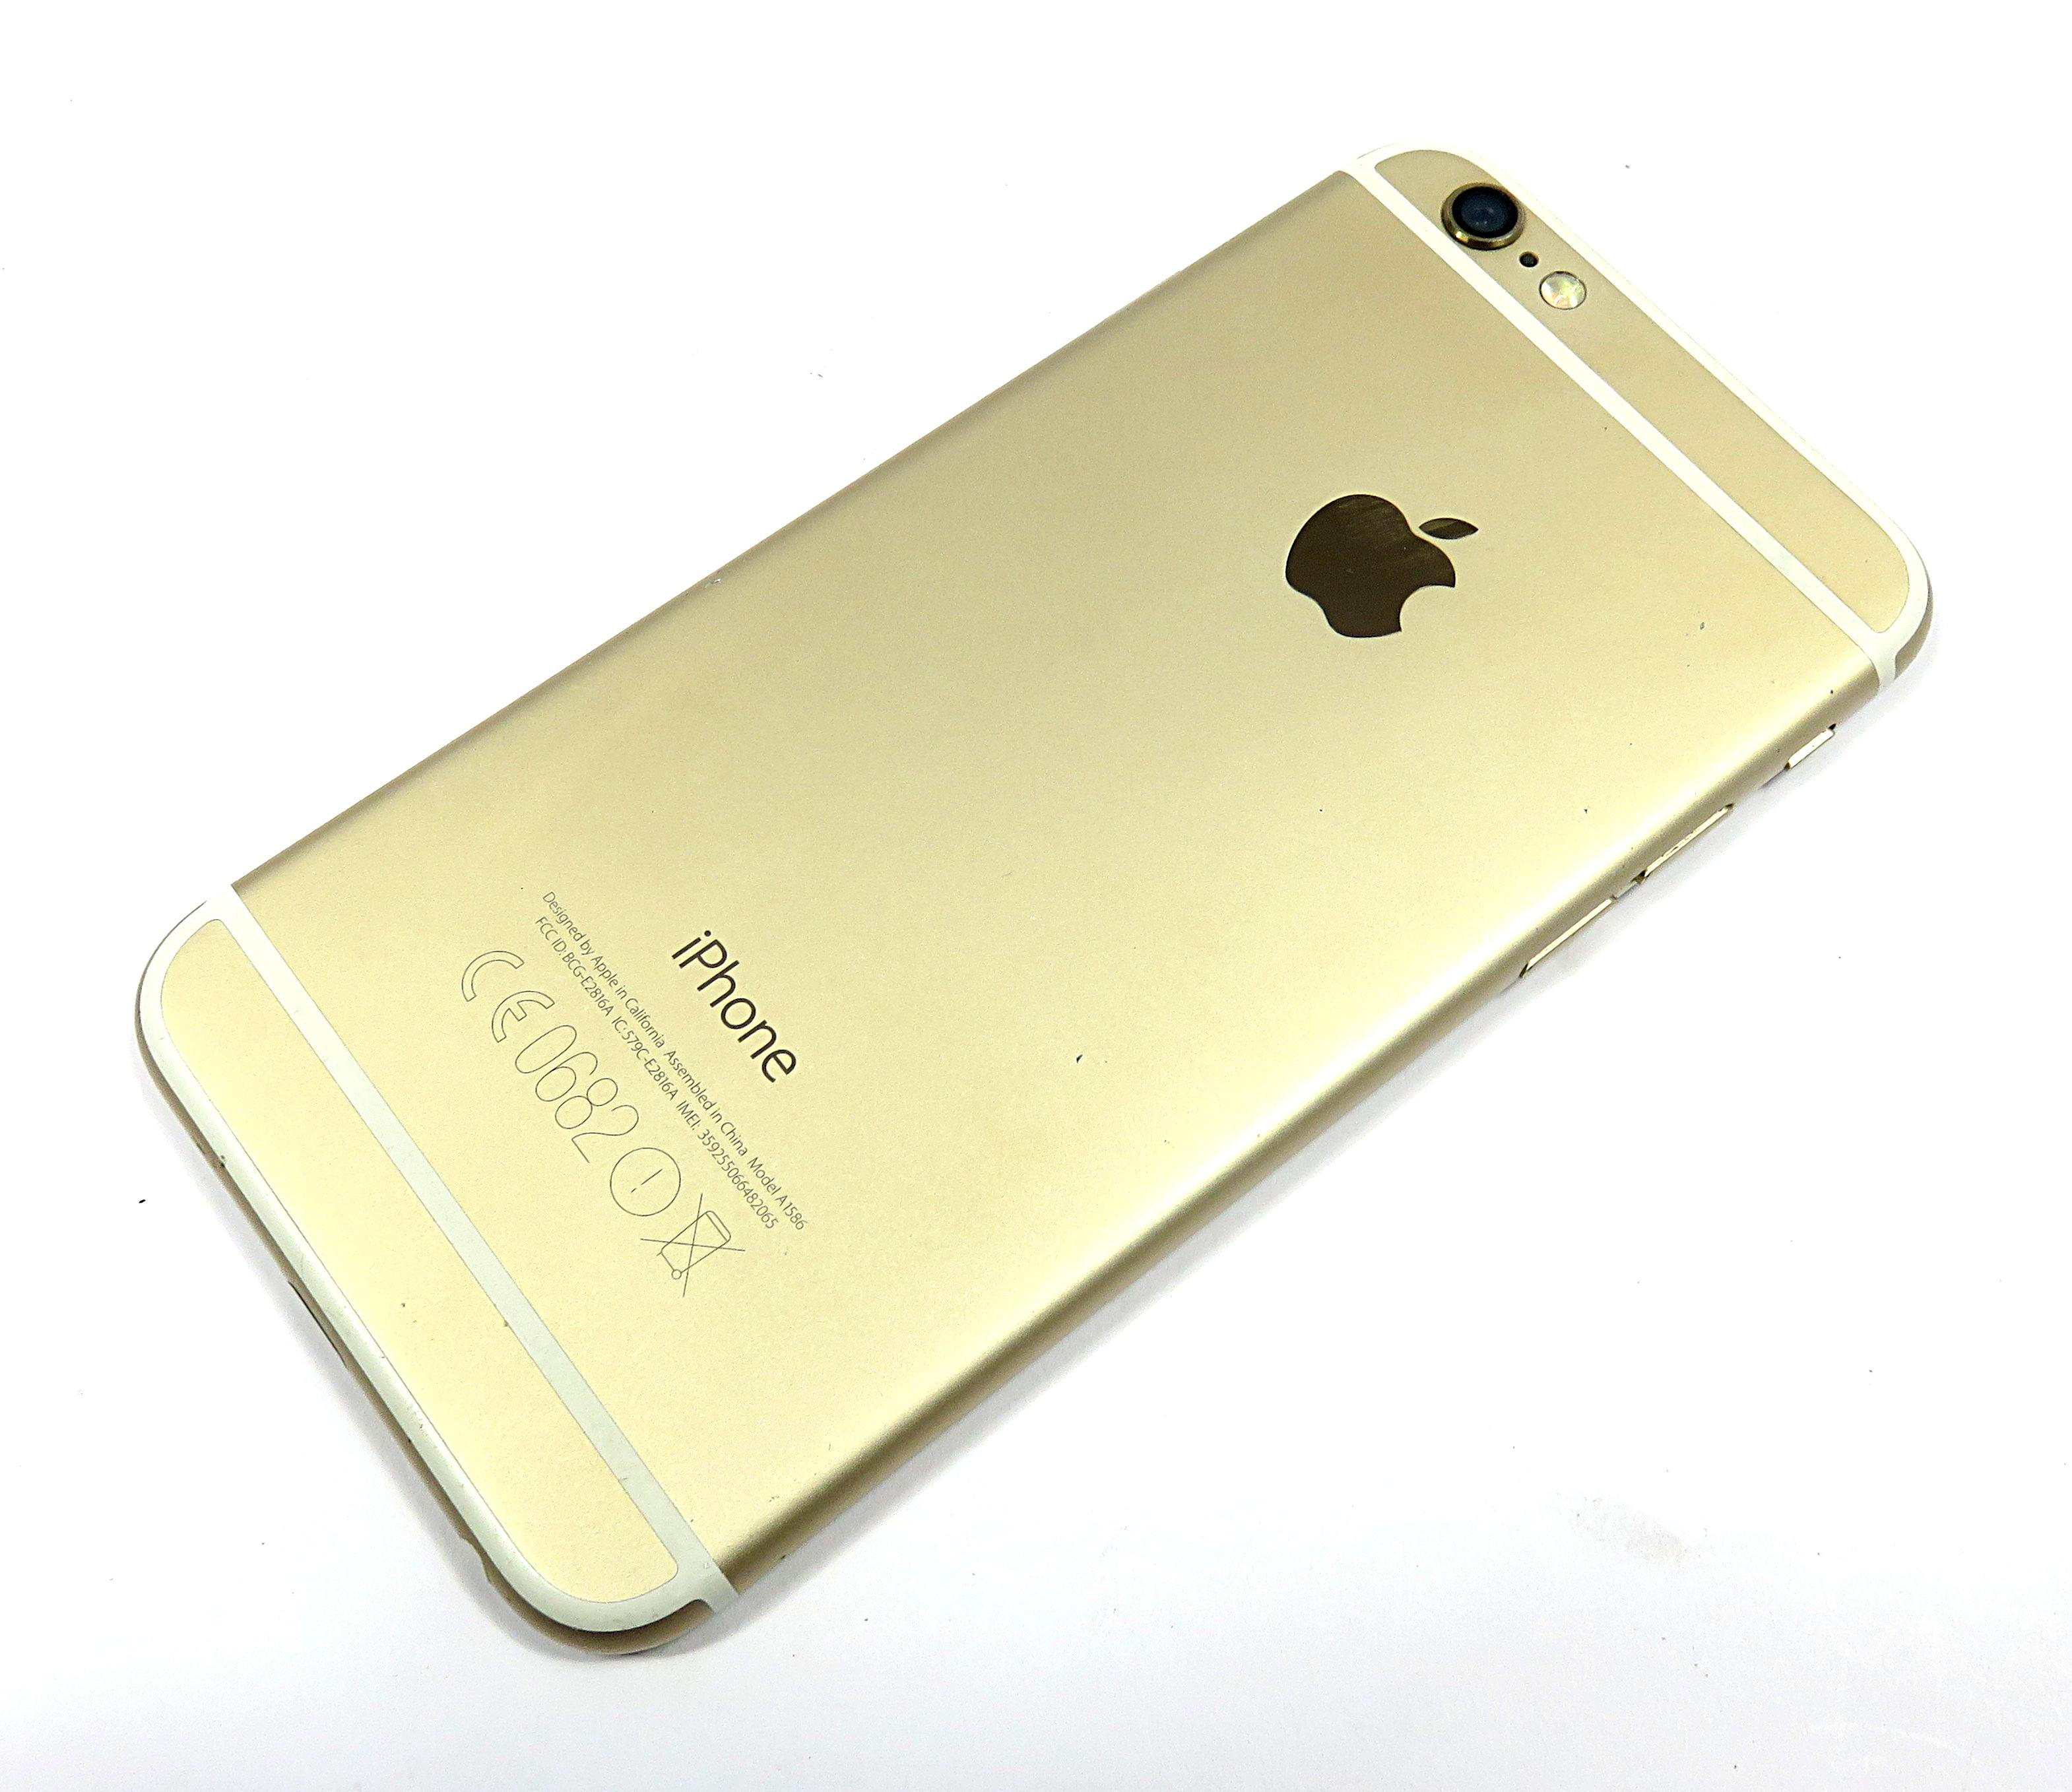 Gold / Grade B//Apple A1586 iPhone 6 64GB / Unlocked ...